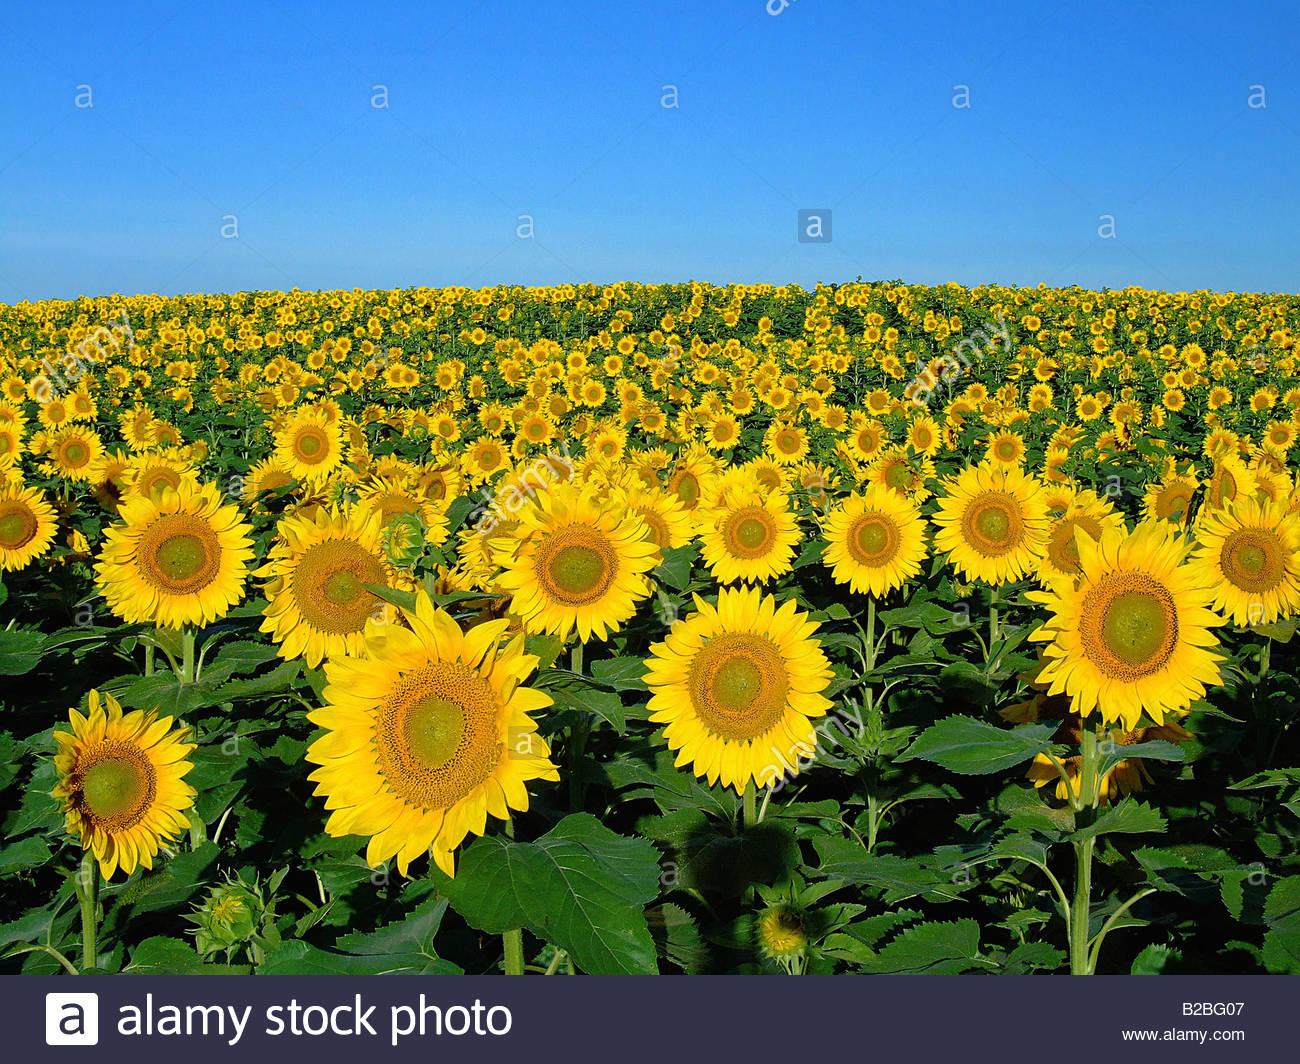 Field of sunflowers - Stock Image